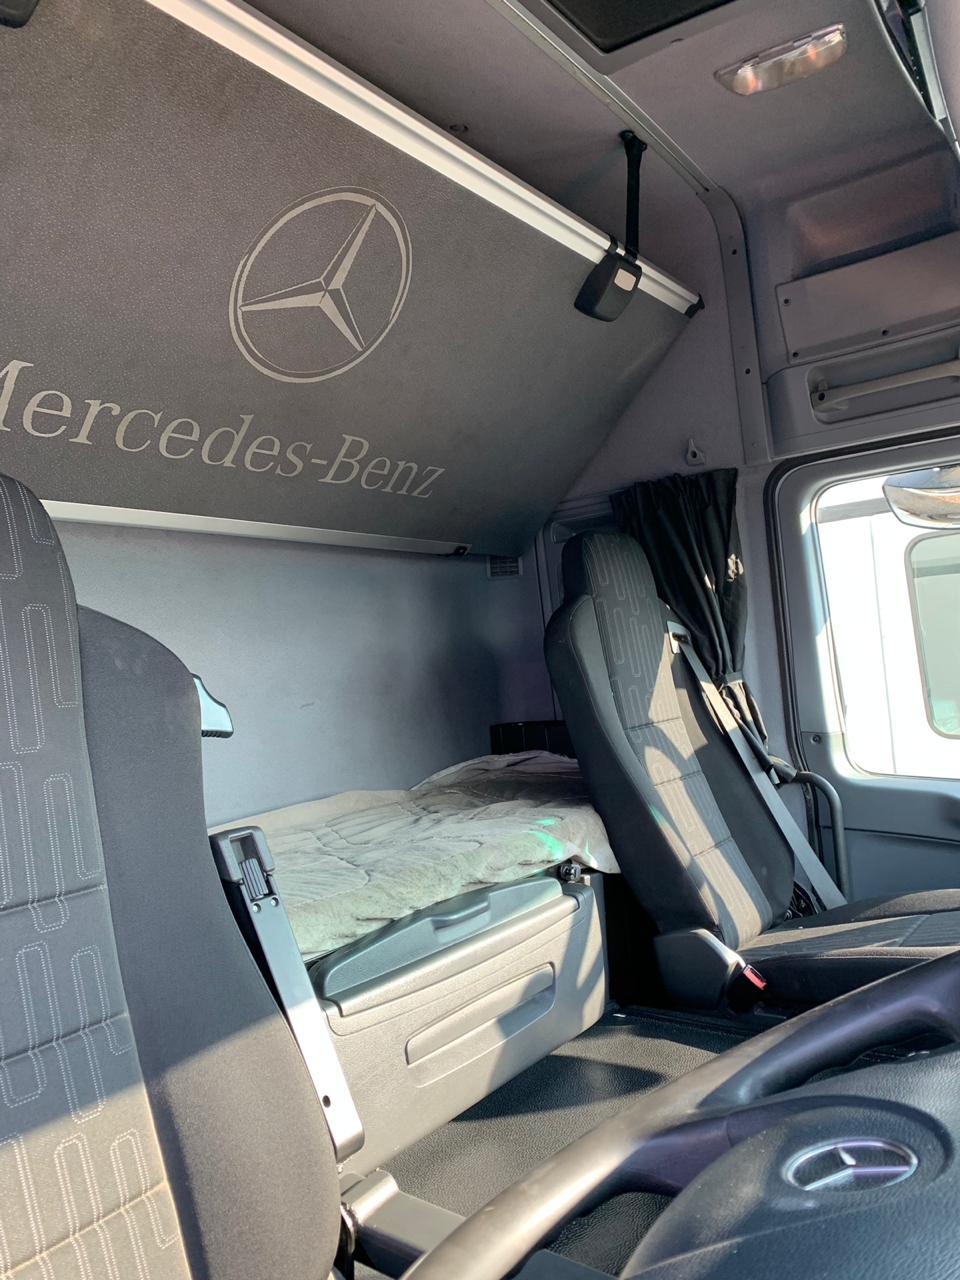 Merc Atros 2644 selling fast